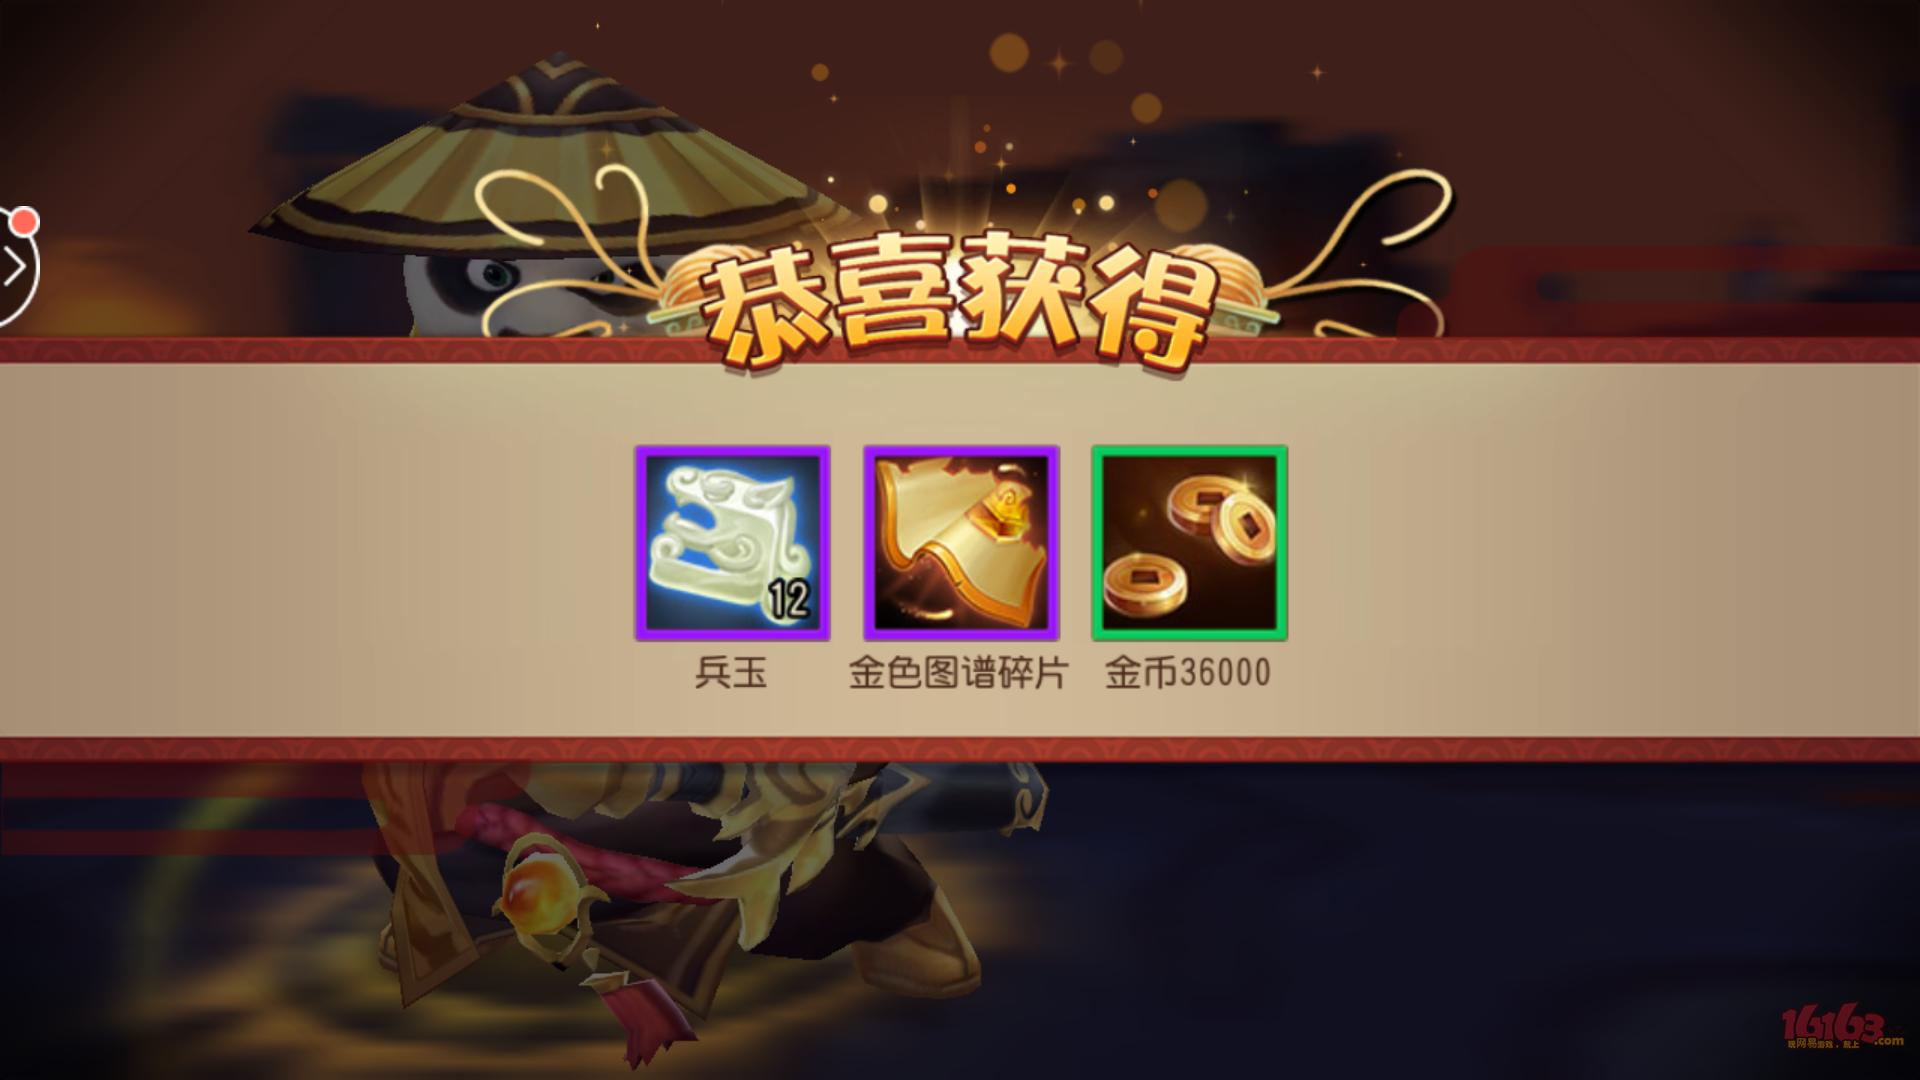 Screenshot_2016-12-01-18-04-47-951_功夫熊猫官方正版.png